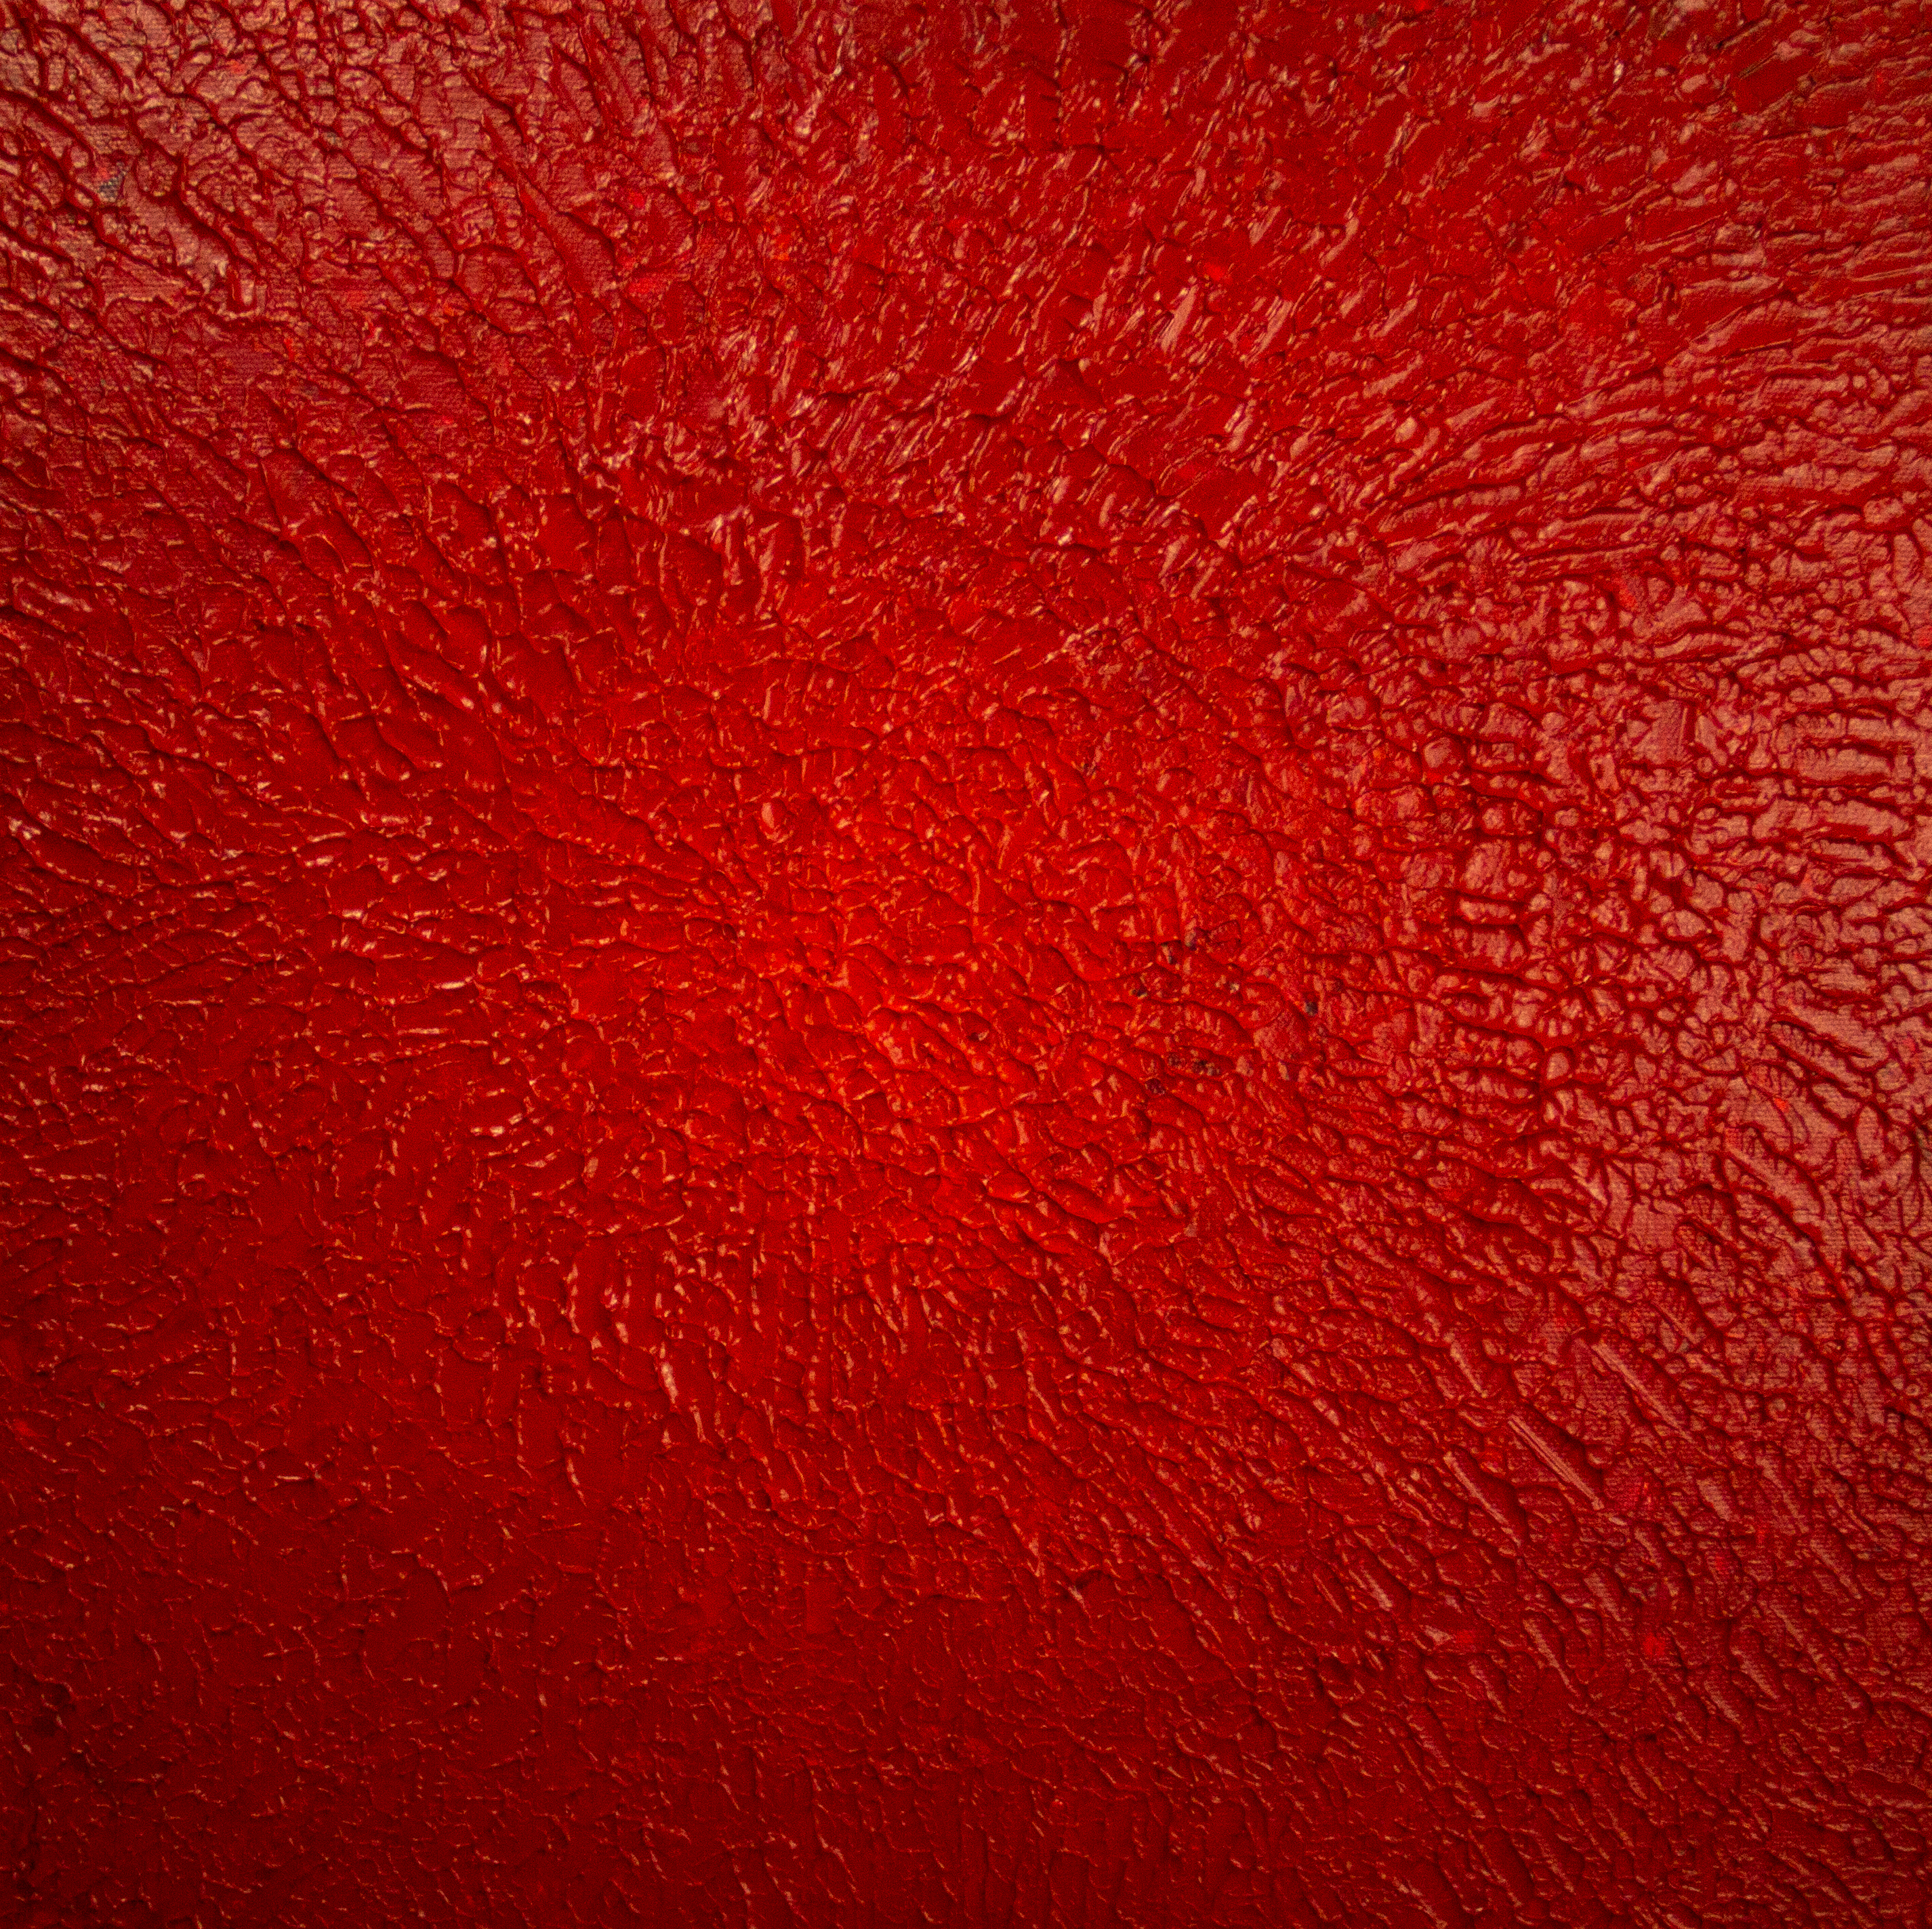 acrylic texture